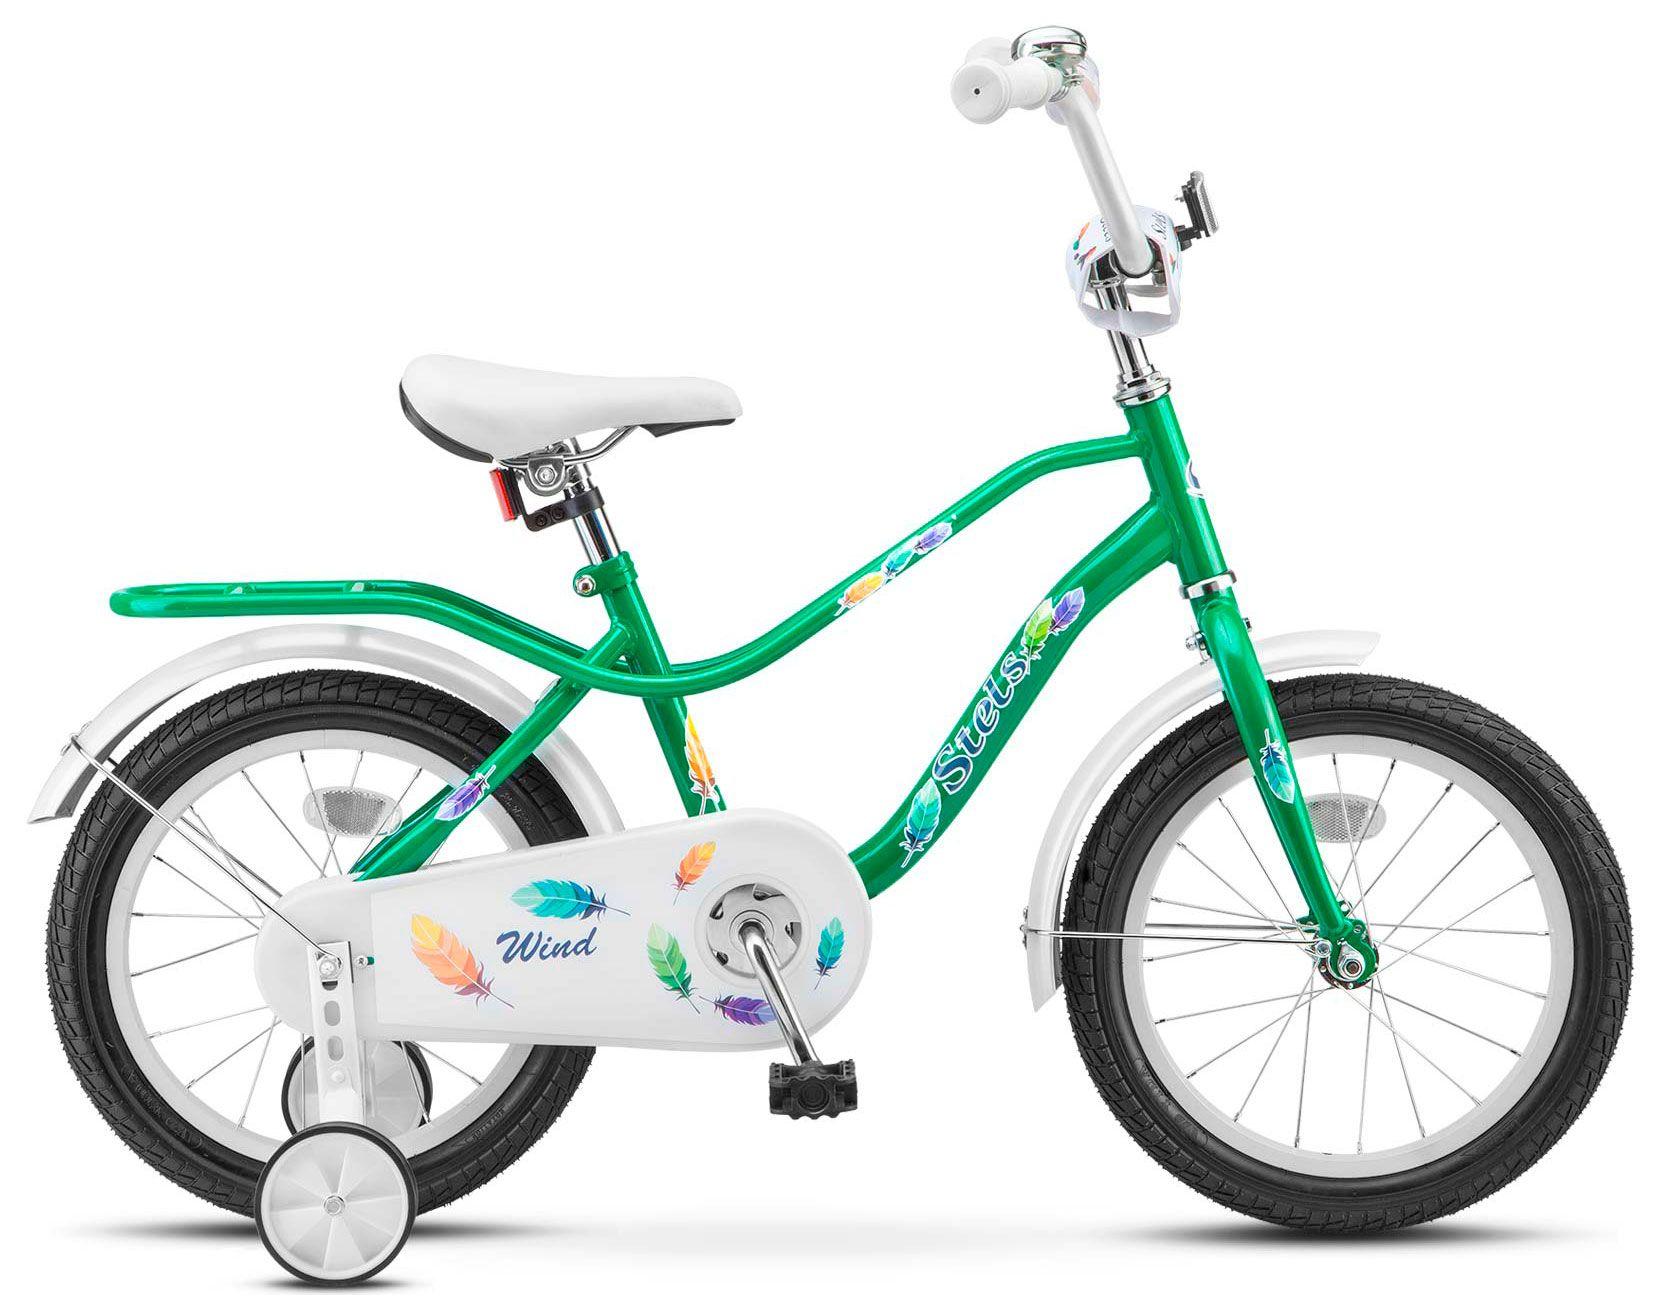 Велосипед Stels Wind 14 (Z010) 2018,  Детские  - артикул:292916